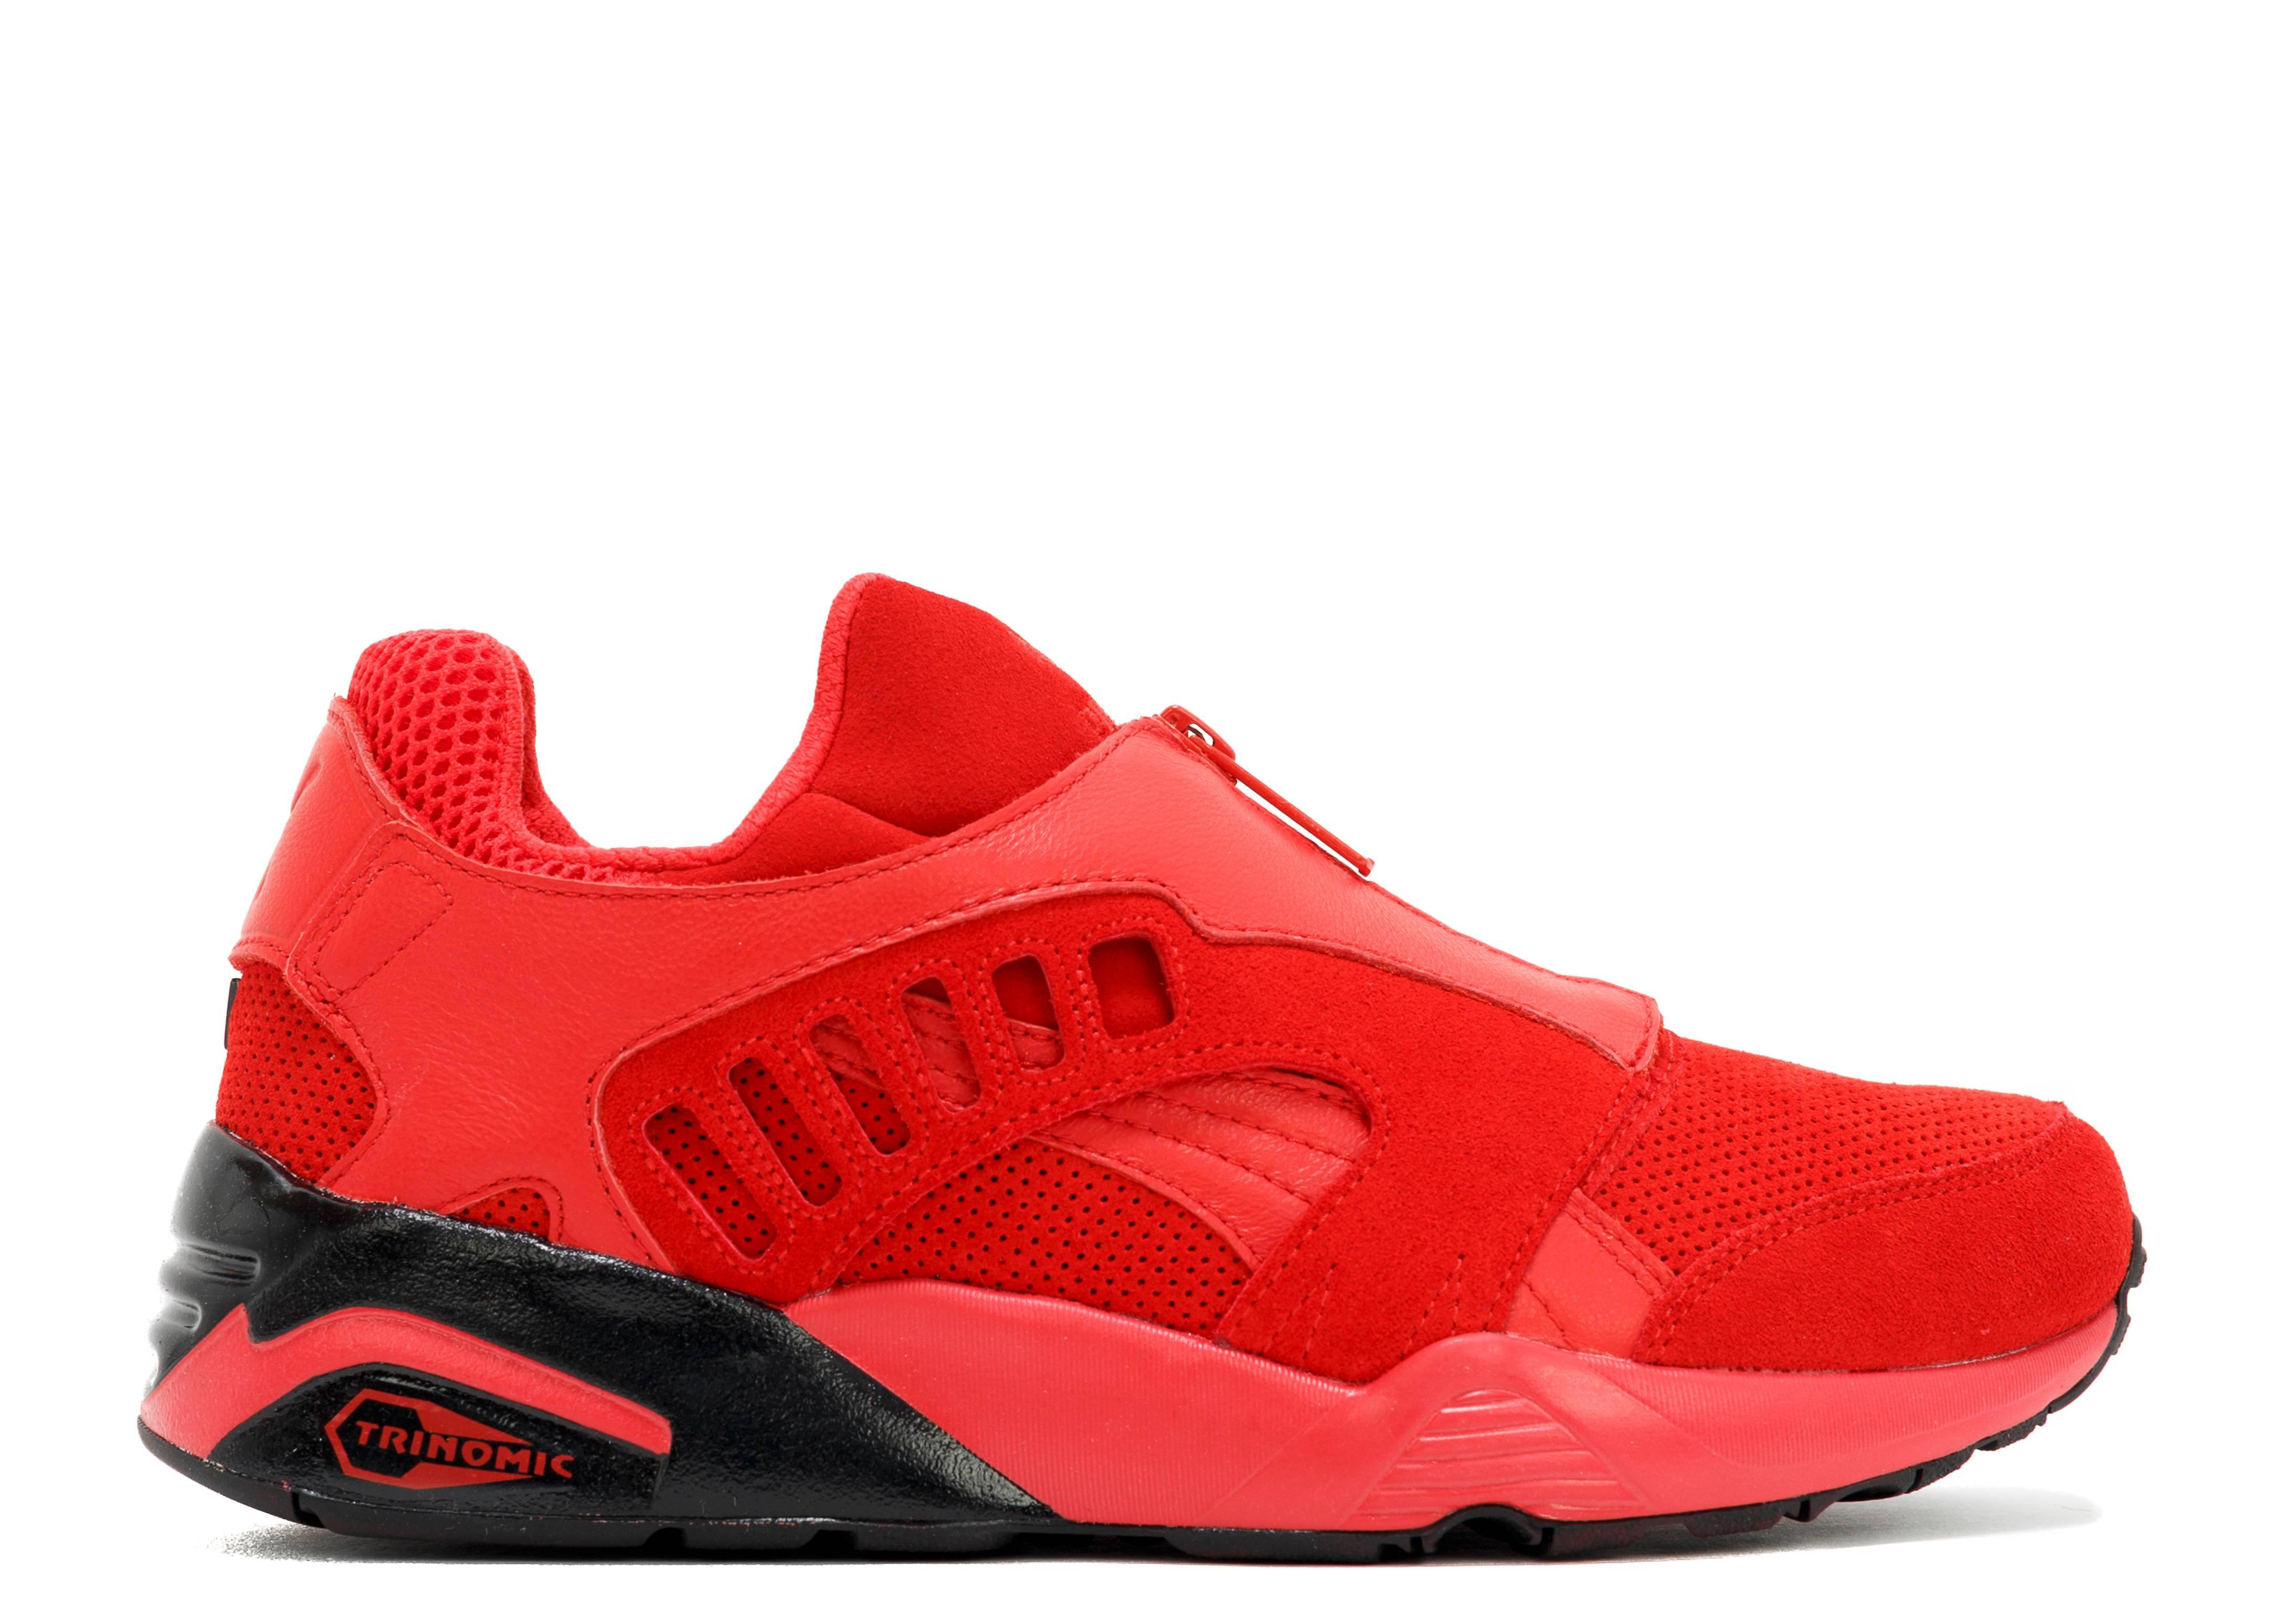 dc42246aefb48b Trinomic Zip - Puma - 36144801 - high risk red black